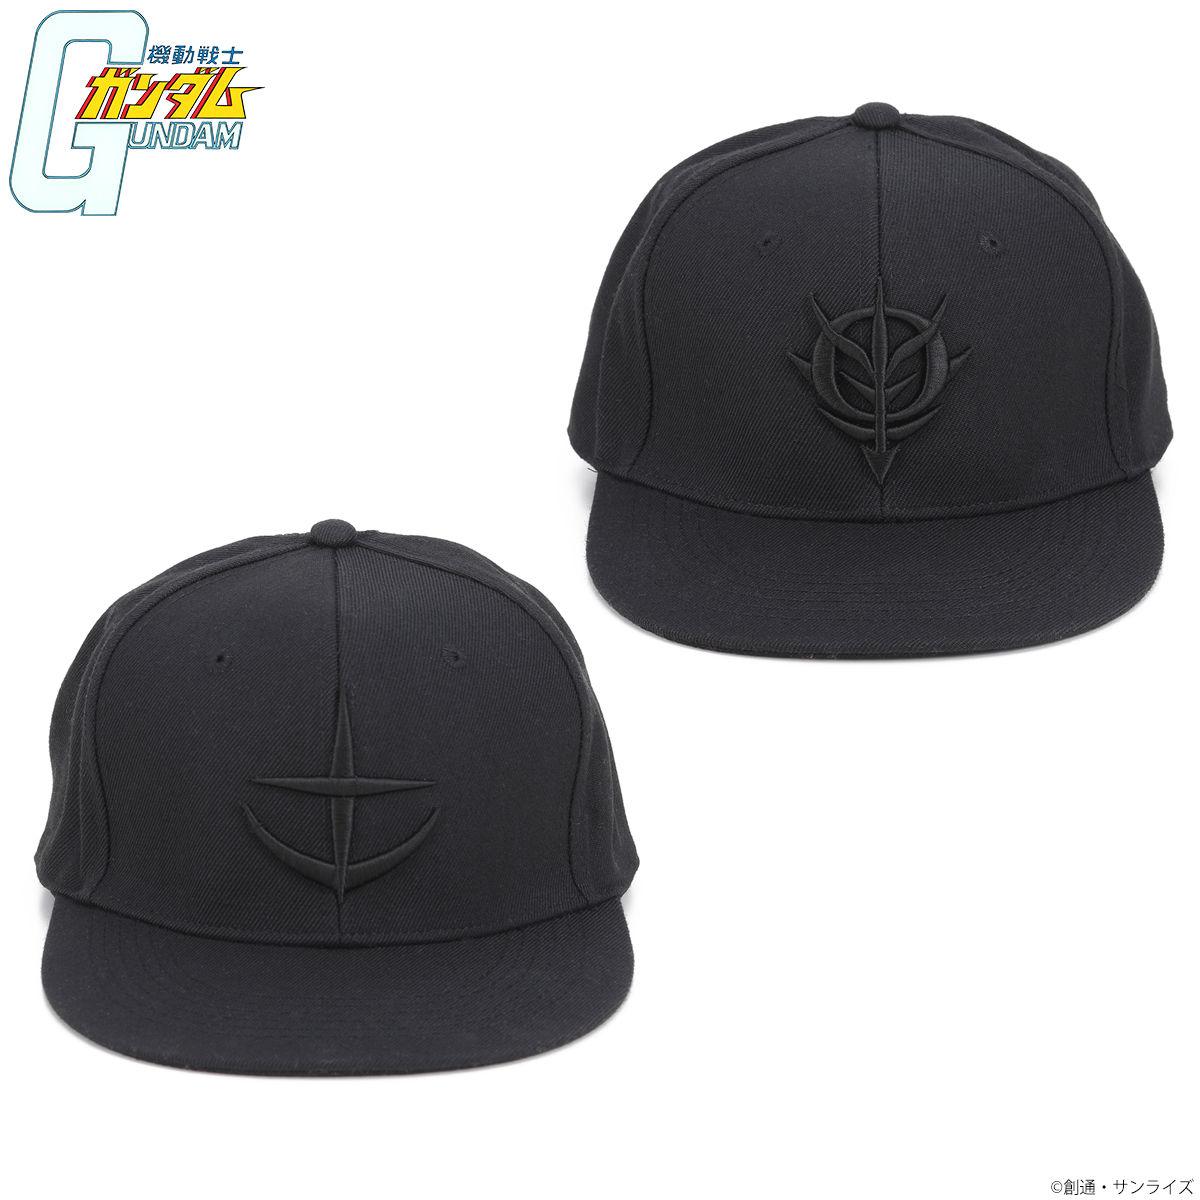 Mobile Suit Gundam Black Emblem Cap